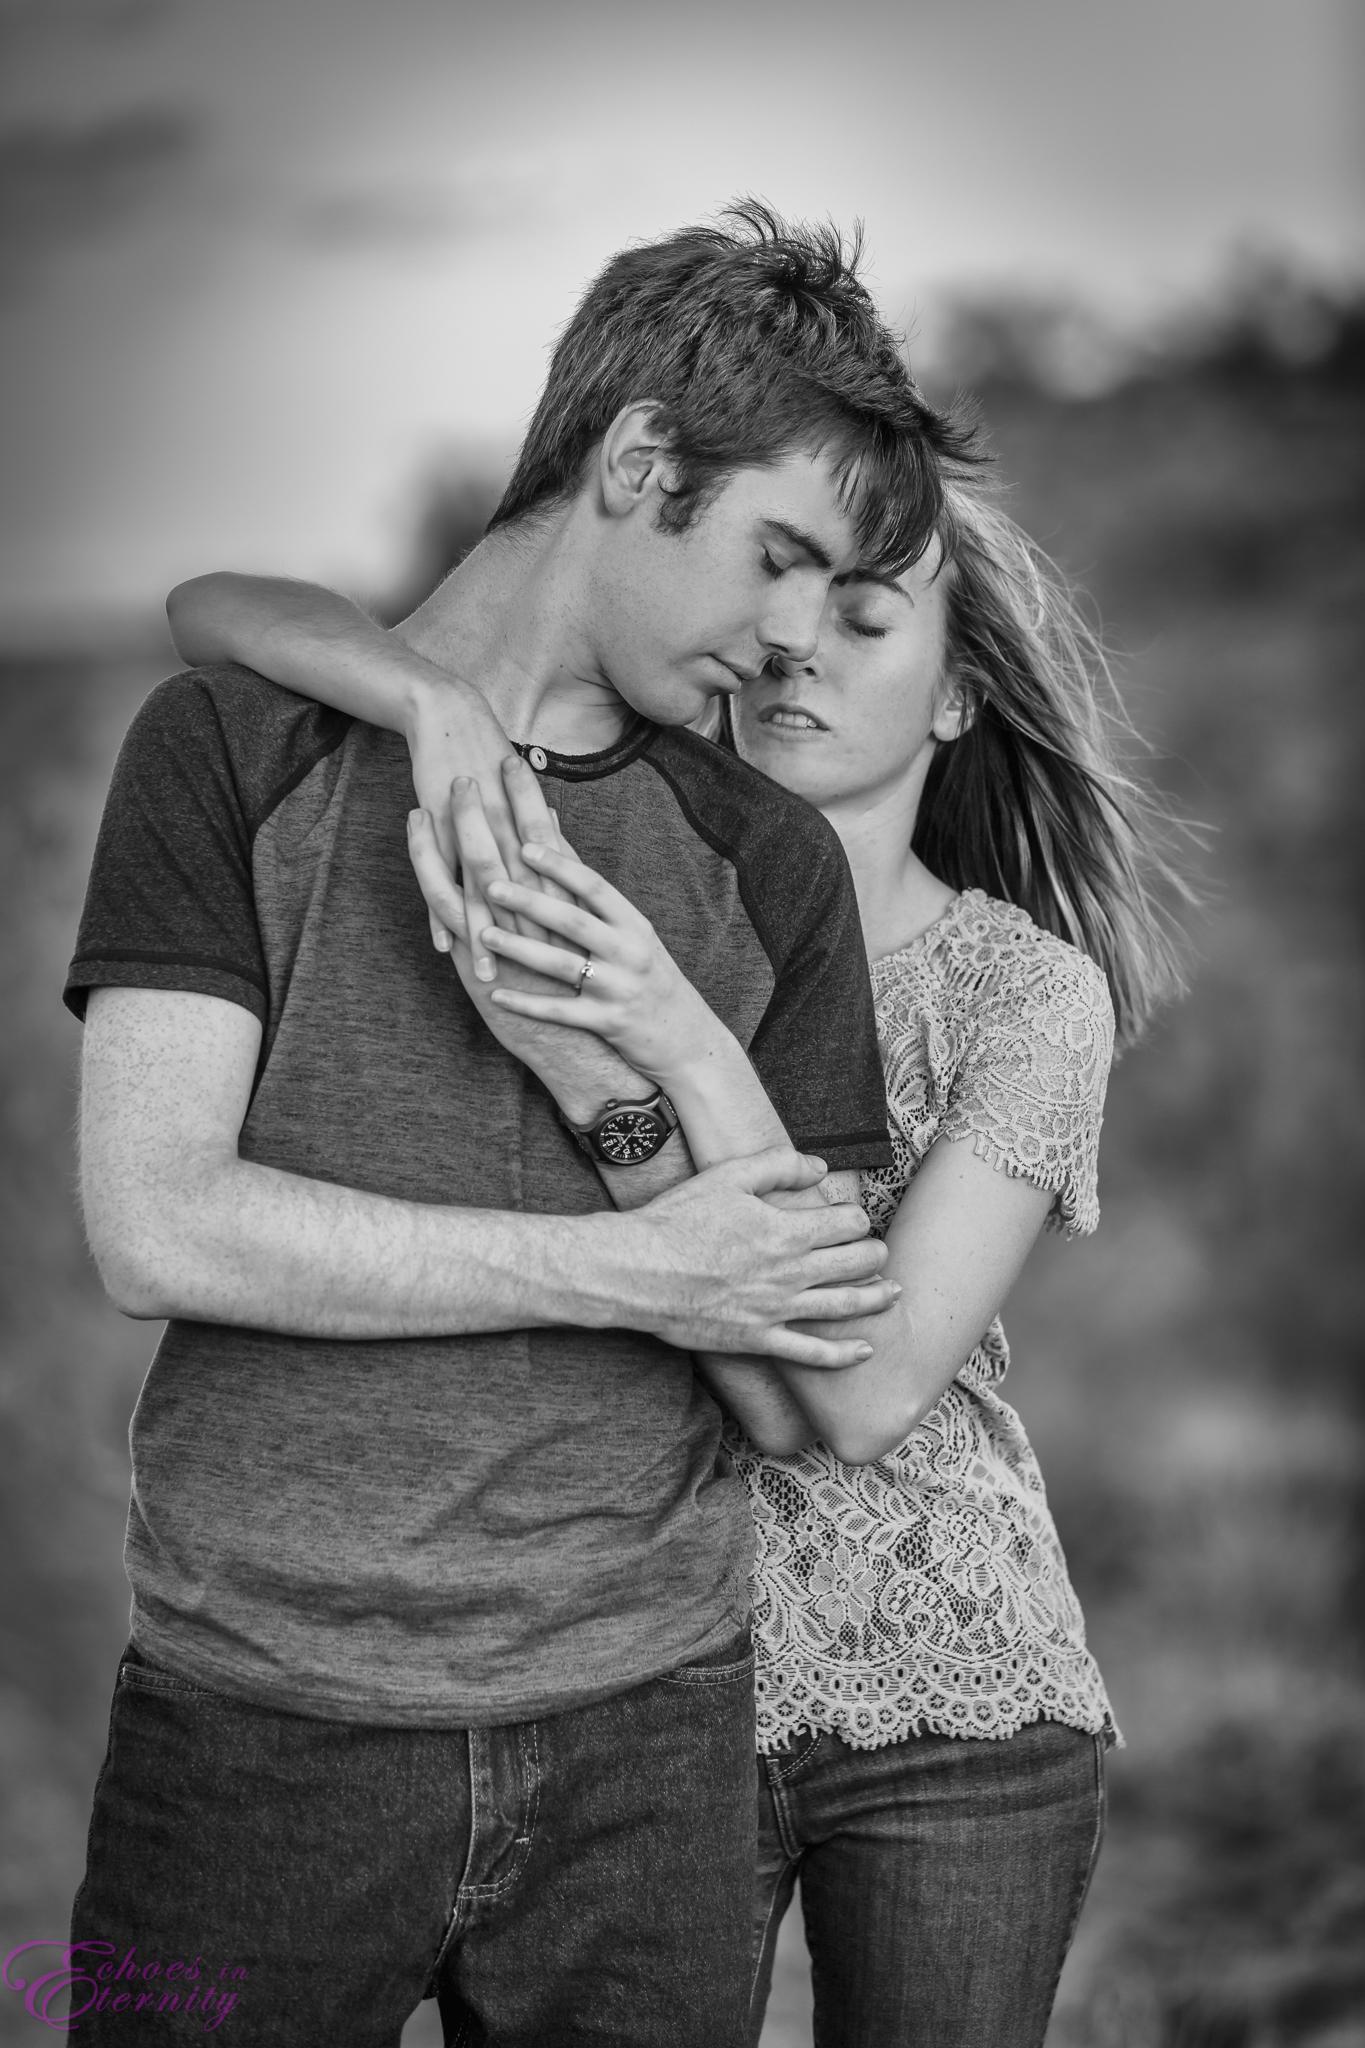 Jeremiah and Hannah Tucson Wedding and Engagement Photographer Sanctuary Cove 05.jpg